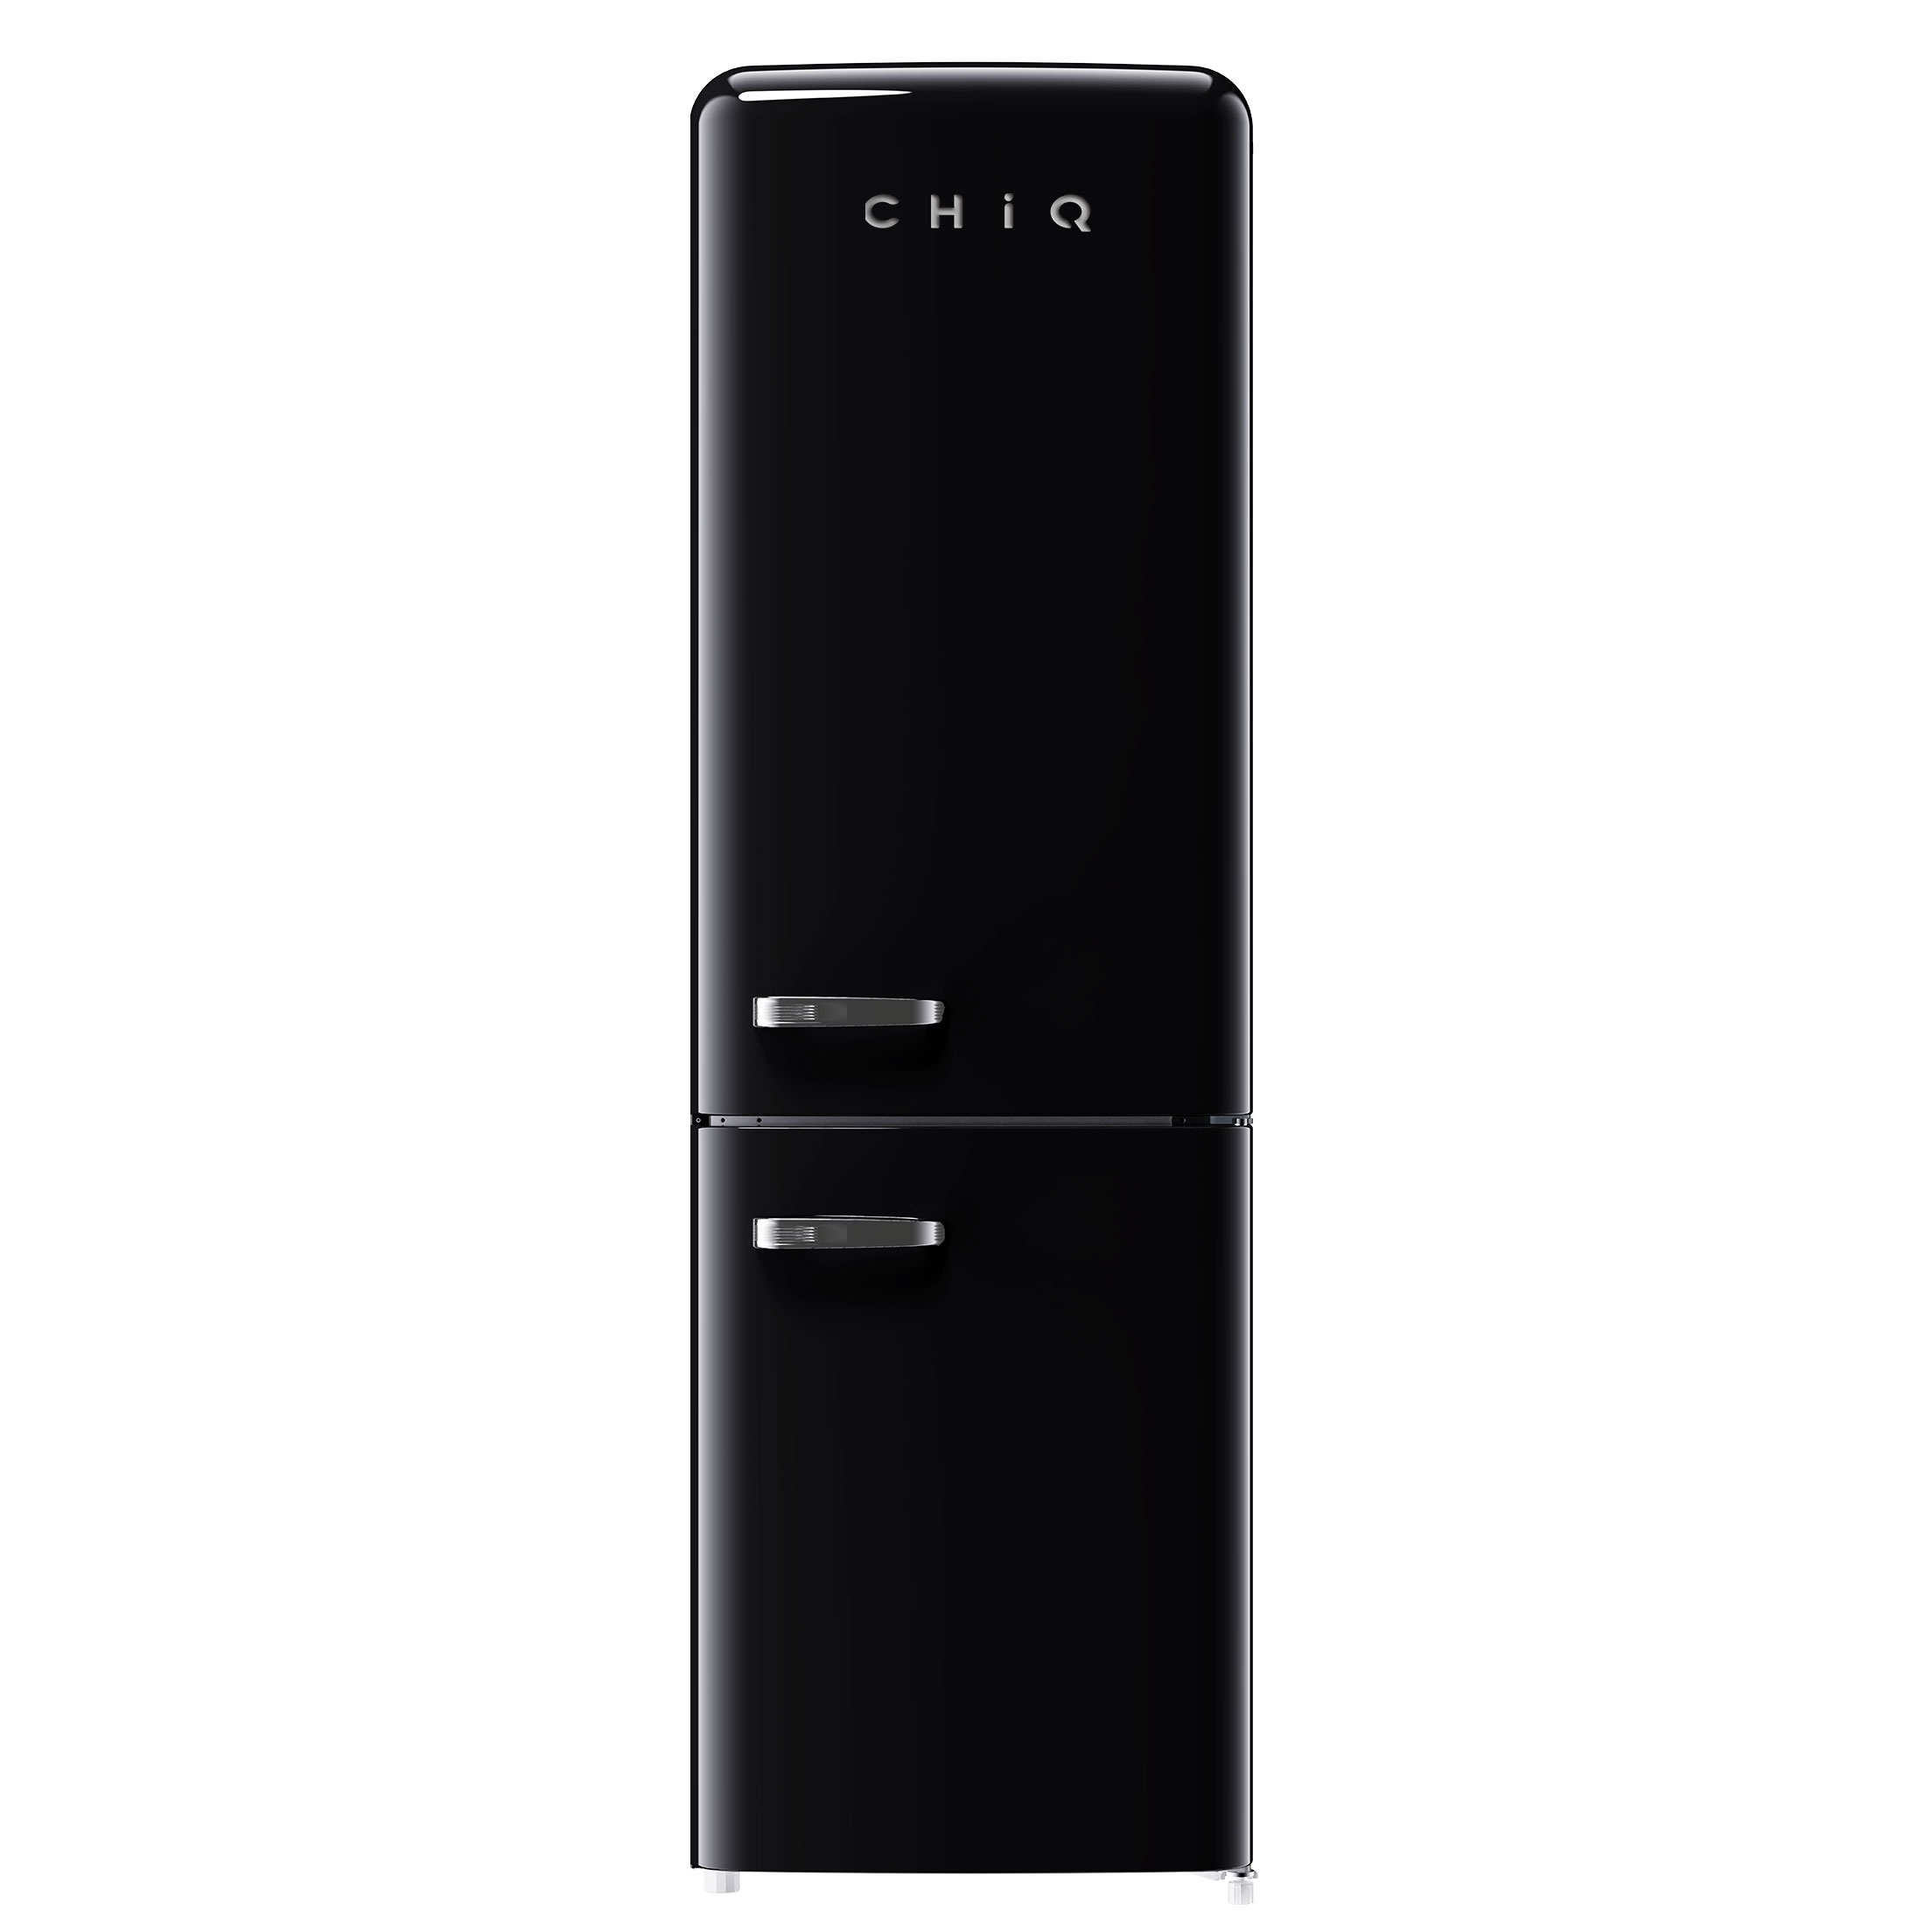 CHiQ CRBM229NB Refrigerator